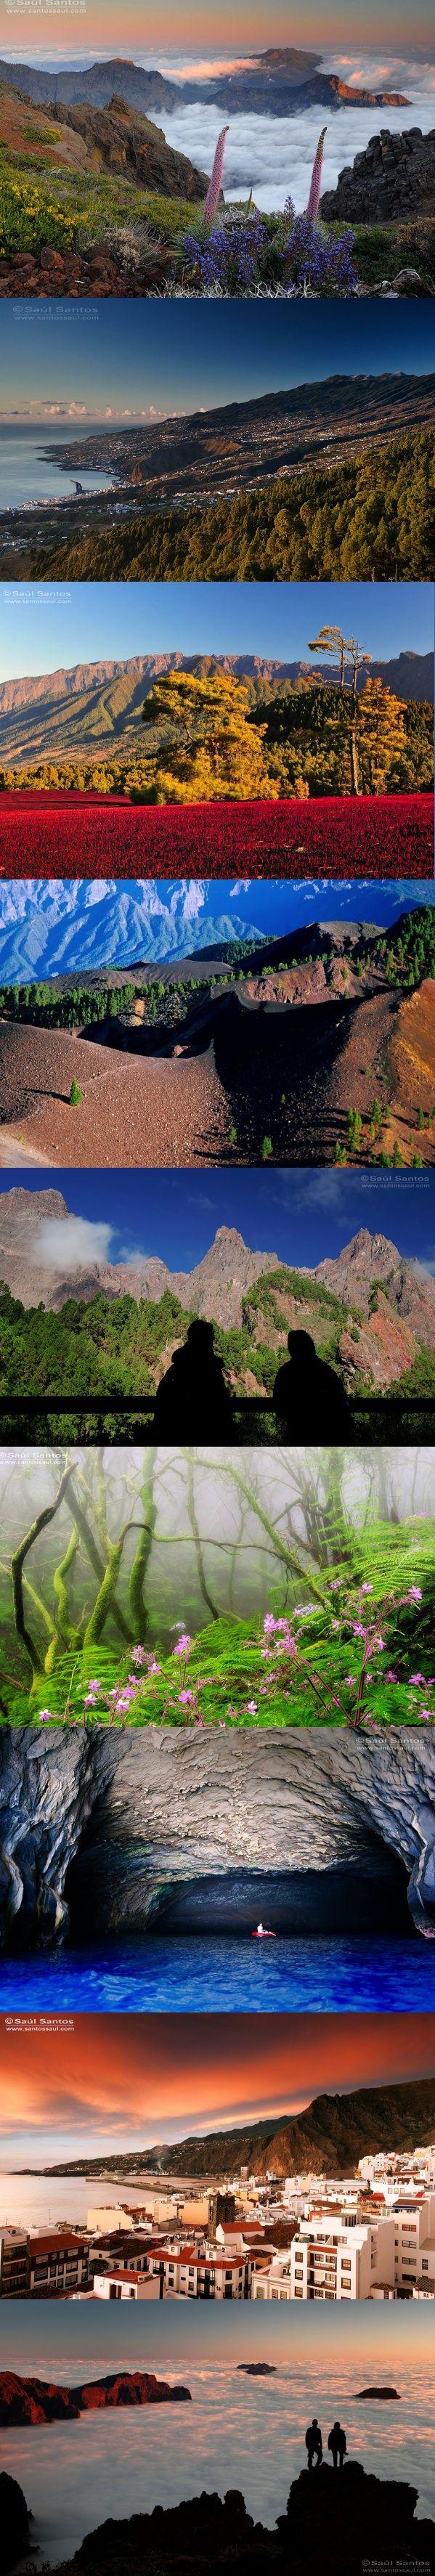 The beautiful island of La Palma, Canary Islands, Spain